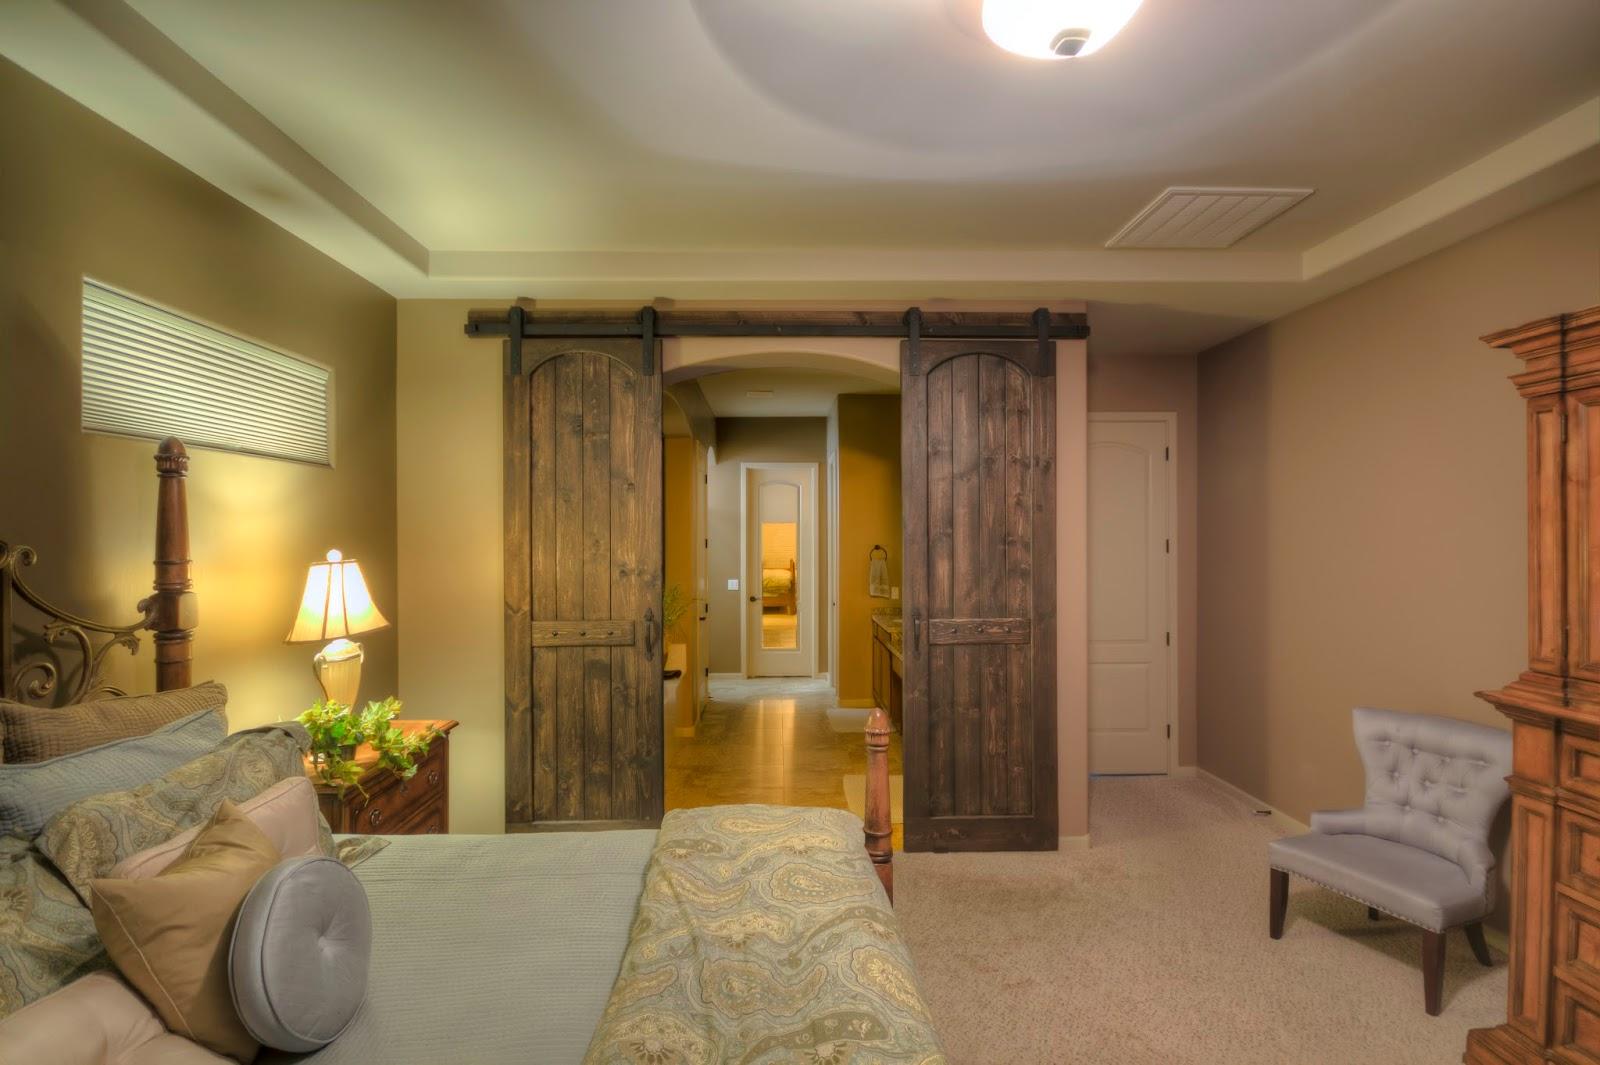 Arizona Barn Doors Just Launched Mission Style Barn Door